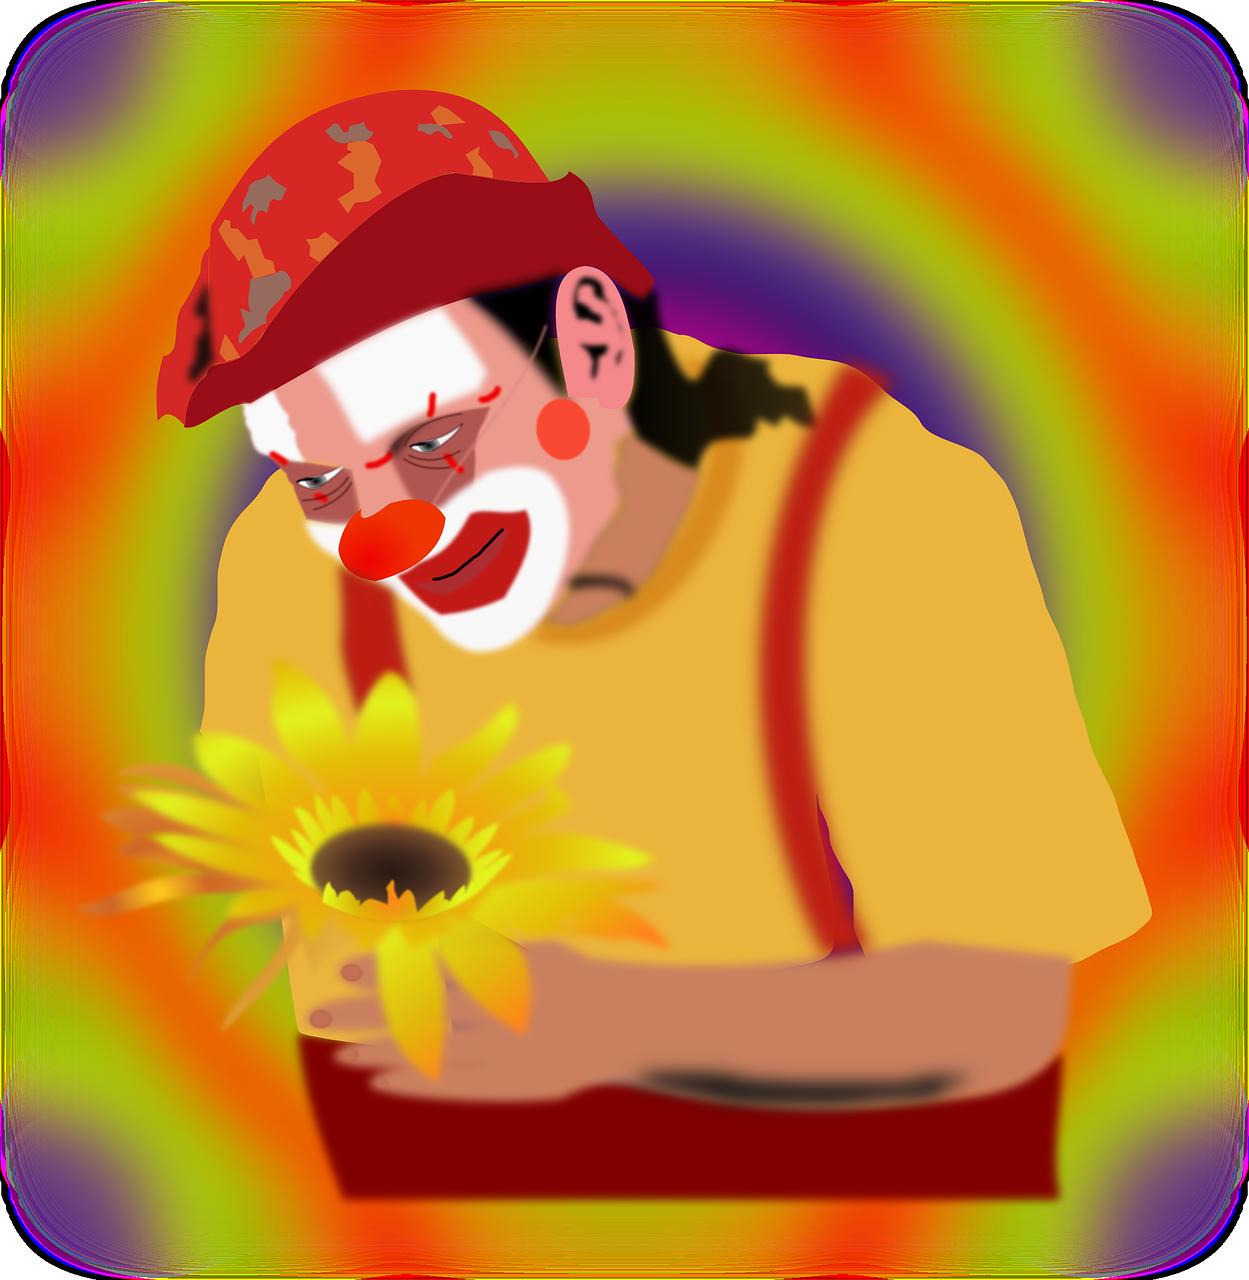 Kind clipart happy customer. Clown joker funny circus